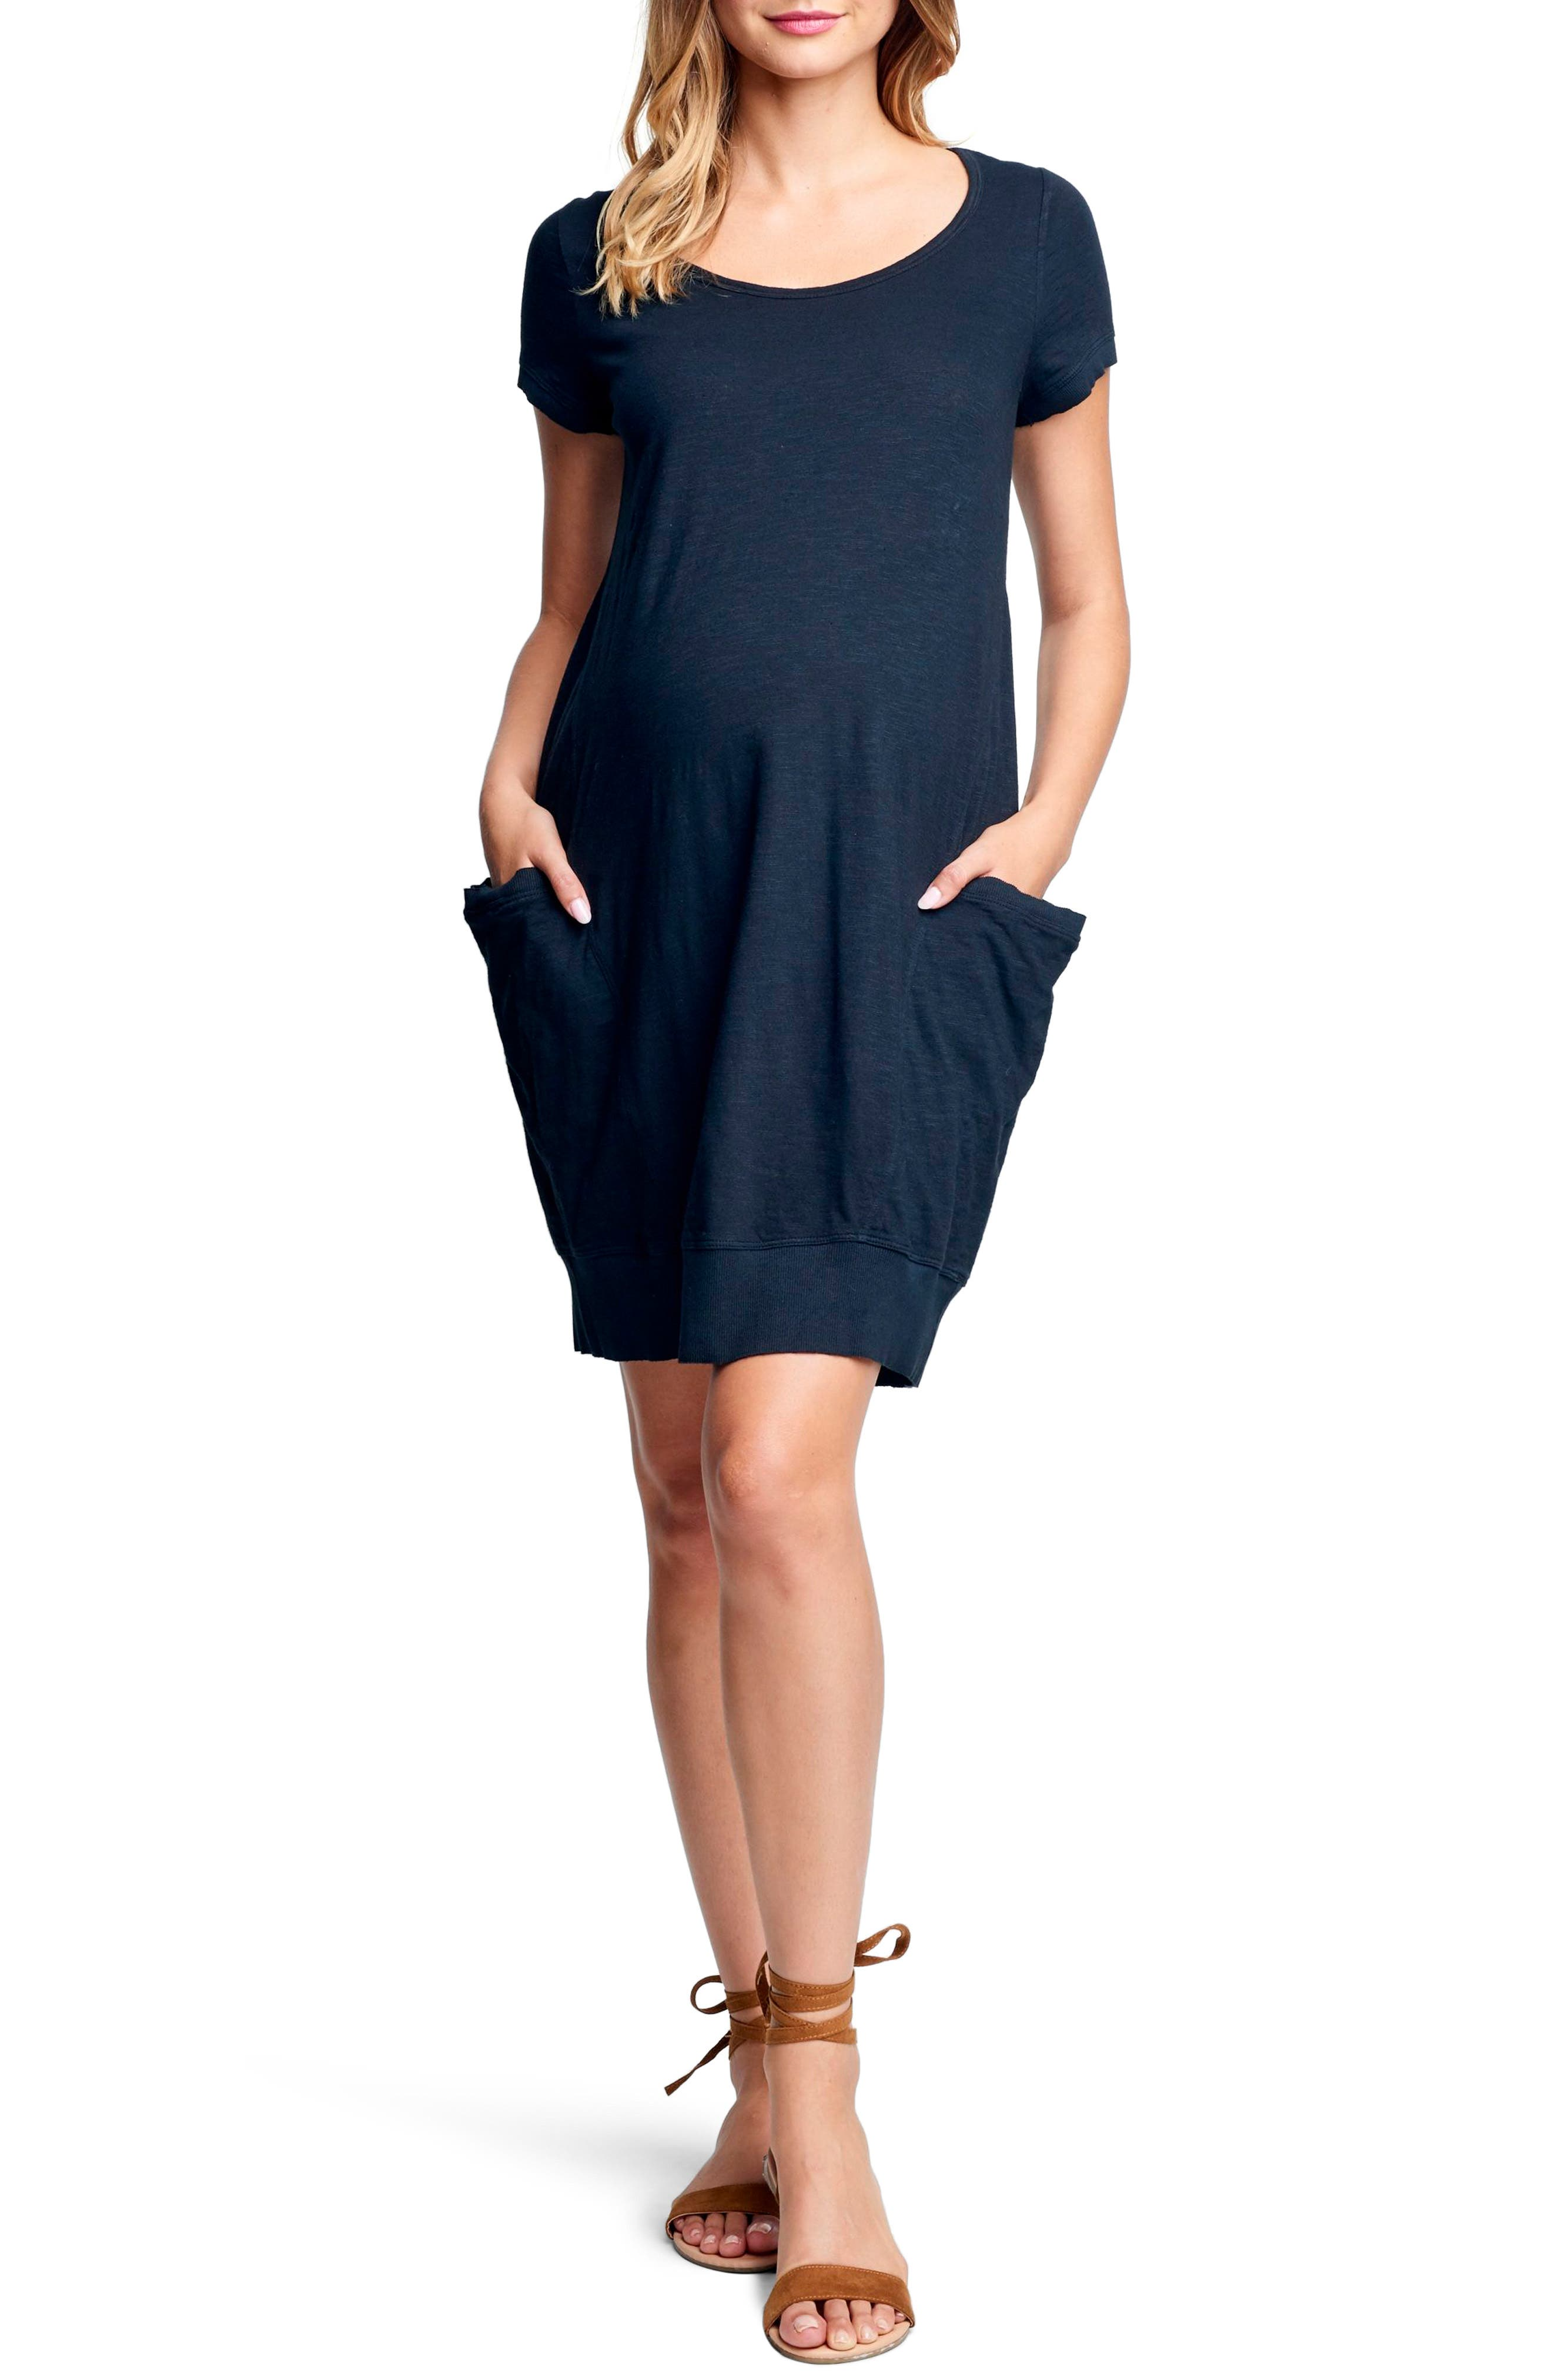 Maternal America Side Pocket Maternity Dress